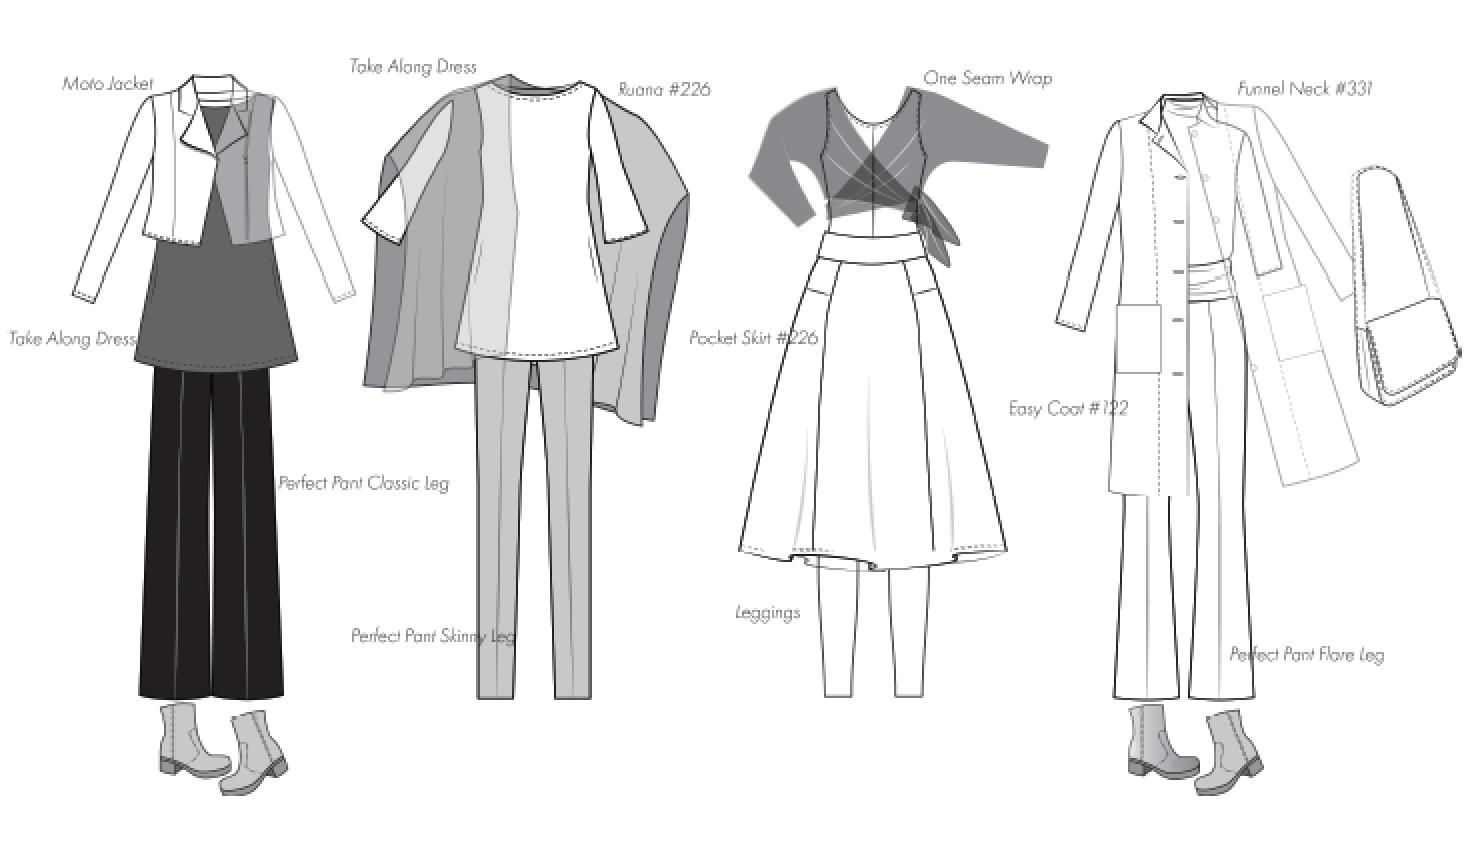 Capsule Wardrobe Christine Jonson Sewing Patterns Winter 2018 2019